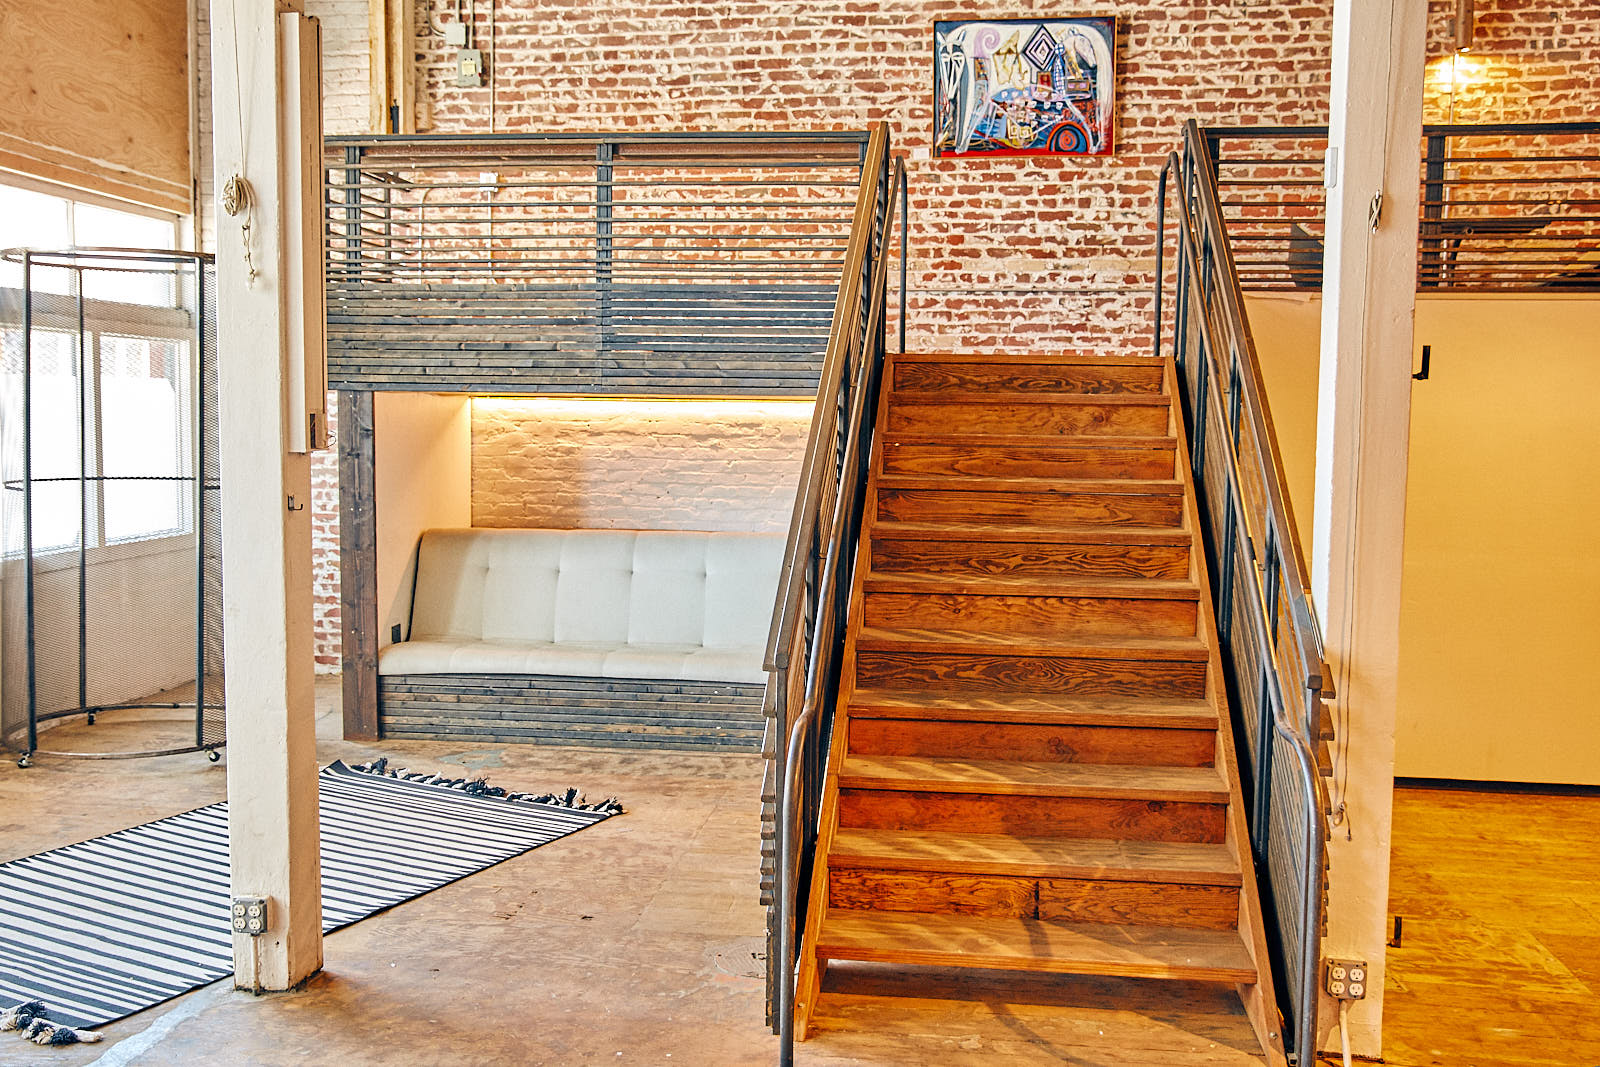 First floor stairs to mezzanine